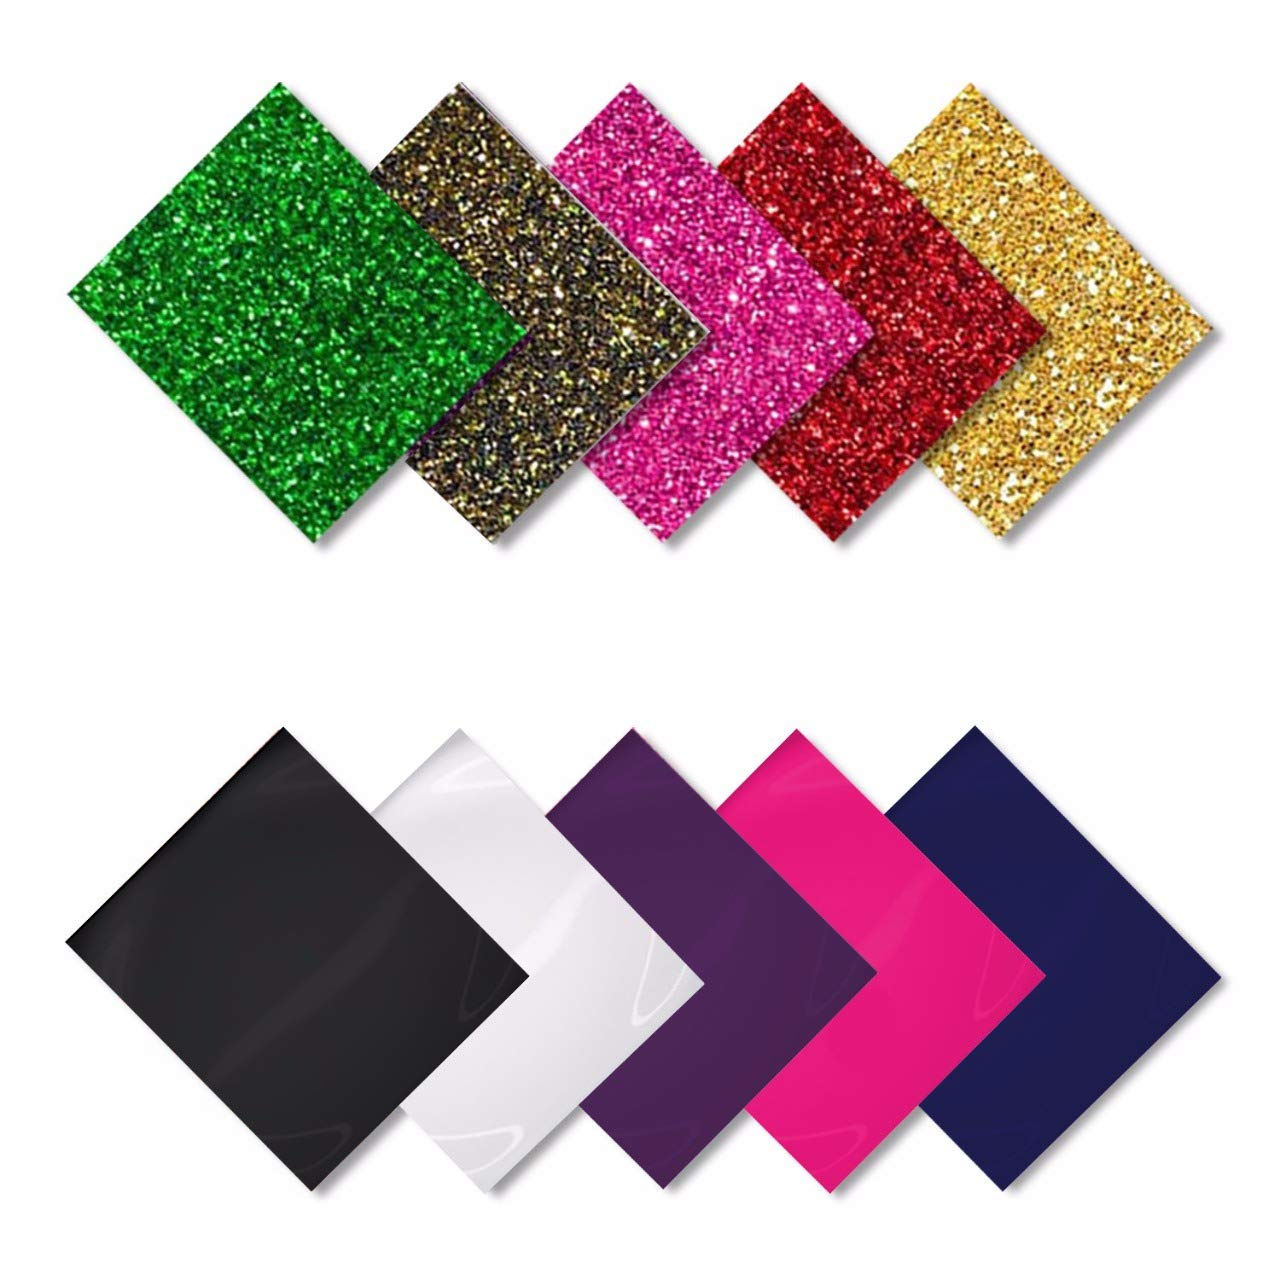 MiPremium PU Heat Transfer Vinyl, Iron On Vinyl Starter Pack, Assorted Bundle Kit of Heat Press Vinyl in 10 Most Popular of Glitter & Plain Colors, Easy Weed, Cut & Press (10 x Pack) VNL-COMBO10